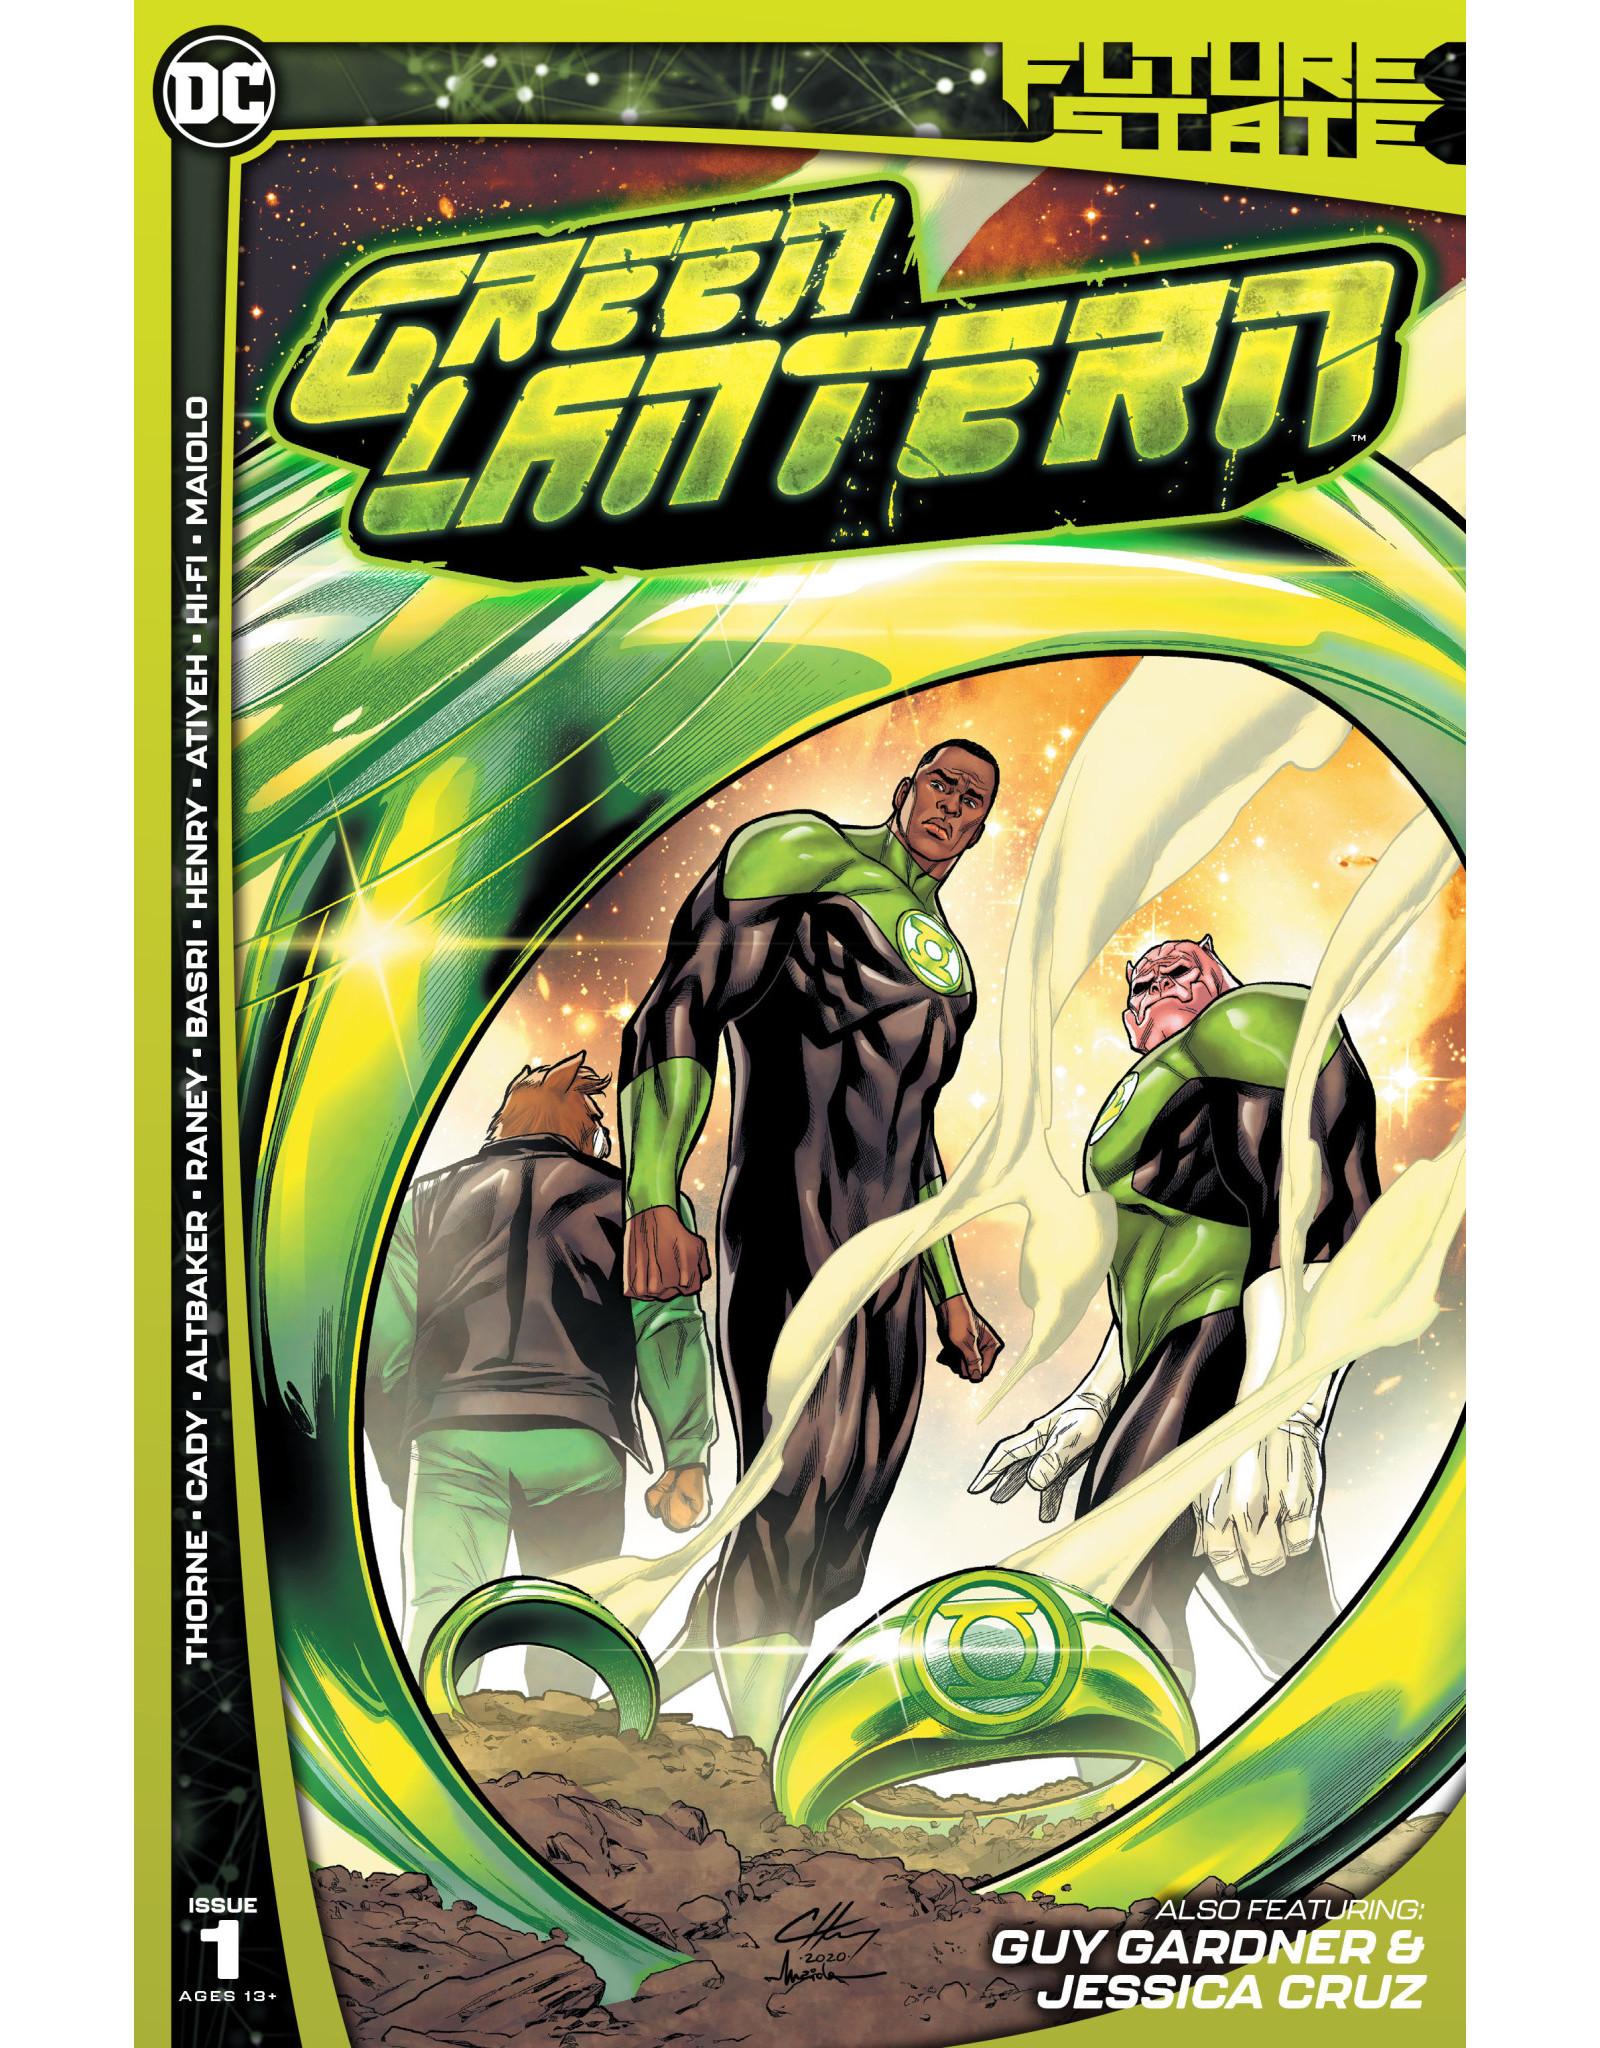 DC Comics FUTURE STATE GREEN LANTERN #1 (OF 2) CVR A CLAYTON HENRY